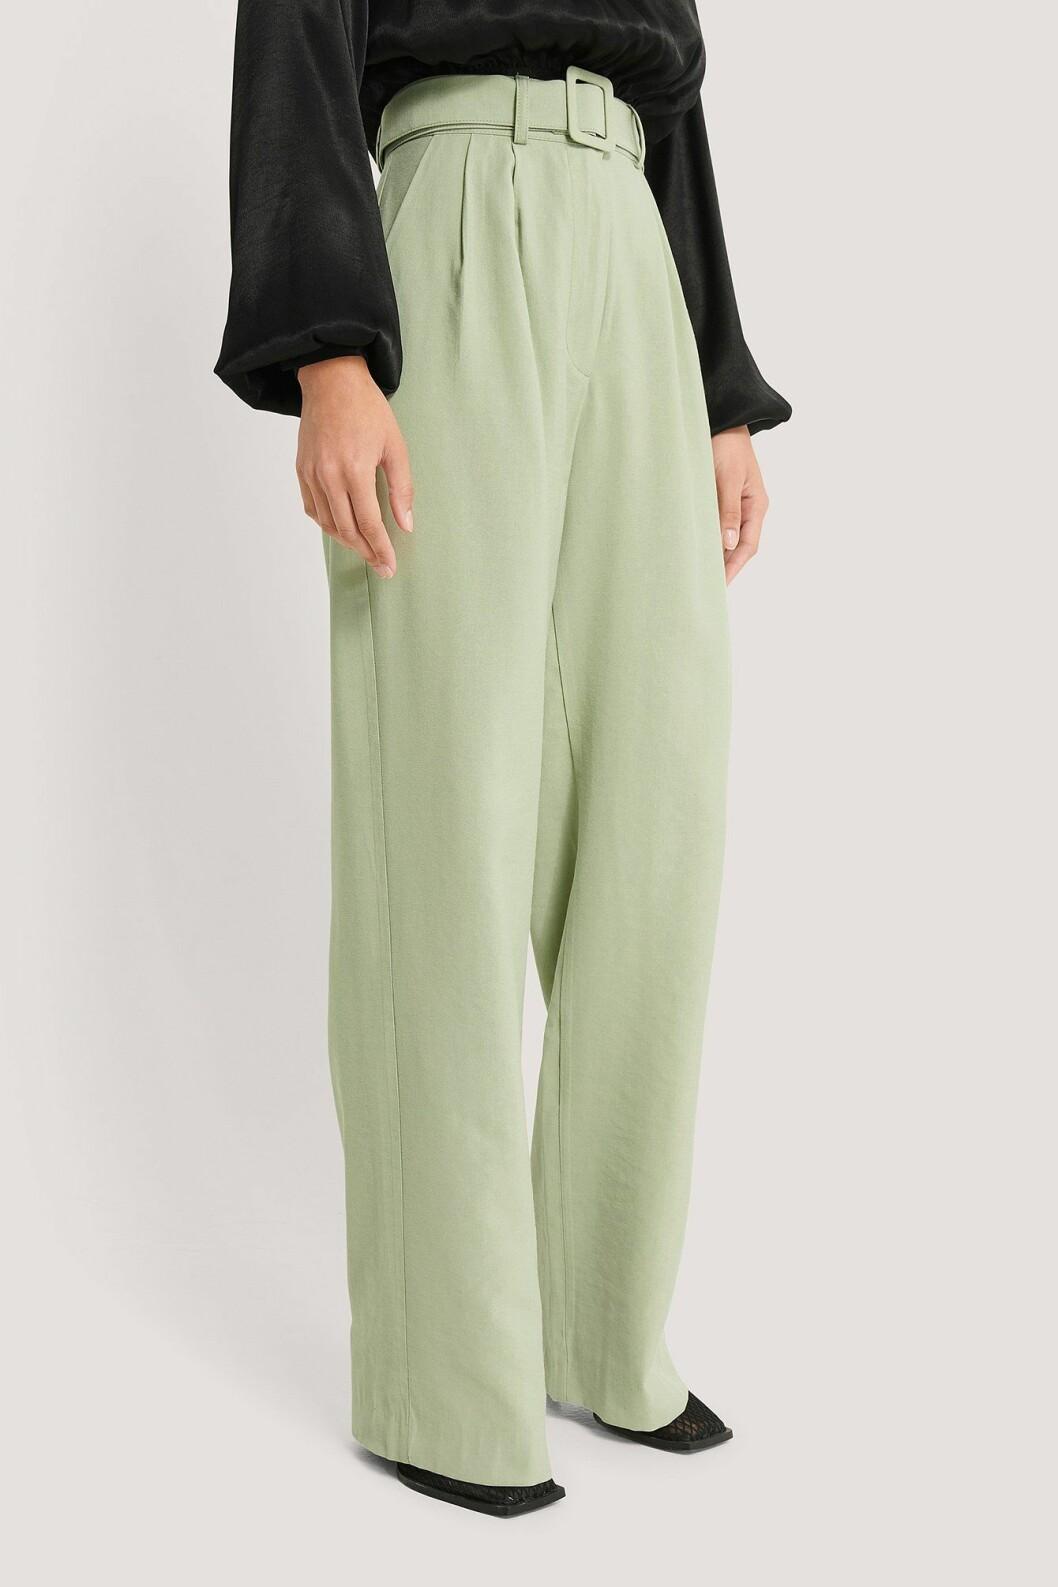 Imane Asry x Na-kd: Gröna kostymbyxor